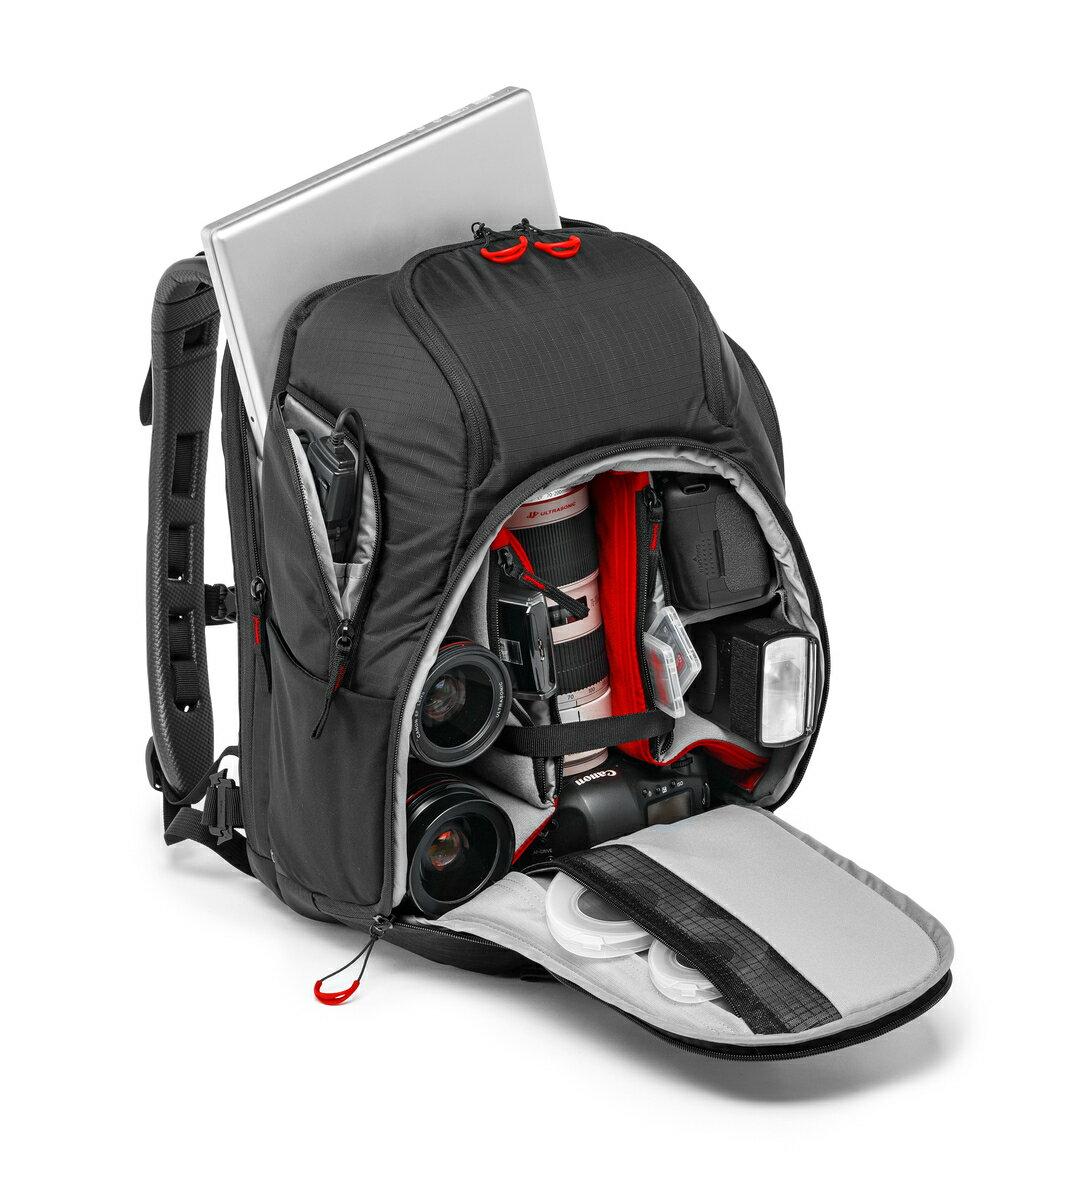 MANFROTTO 曼富圖 MB PL-MTP-120 Multi Pro 旗艦級蝙蝠雙肩背包 後背包 可側取 上取 13吋筆電 2機2鏡1閃 1